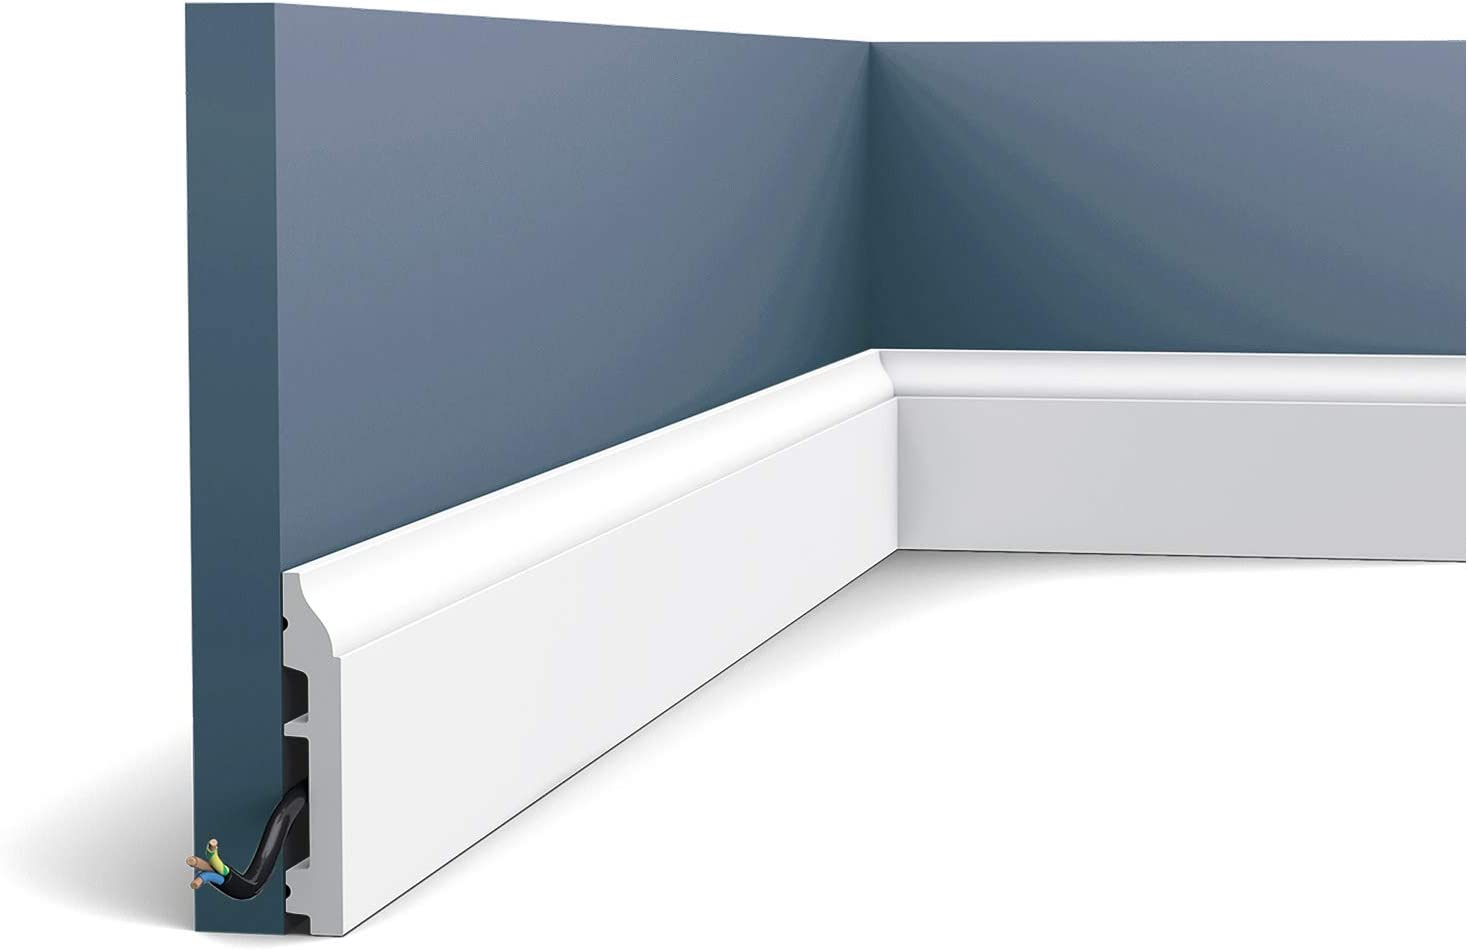 Orac Decor | High Impact Flexible Polyurethane Baseboard Moulding | Primed White | 3-3/8in H x 78in Long